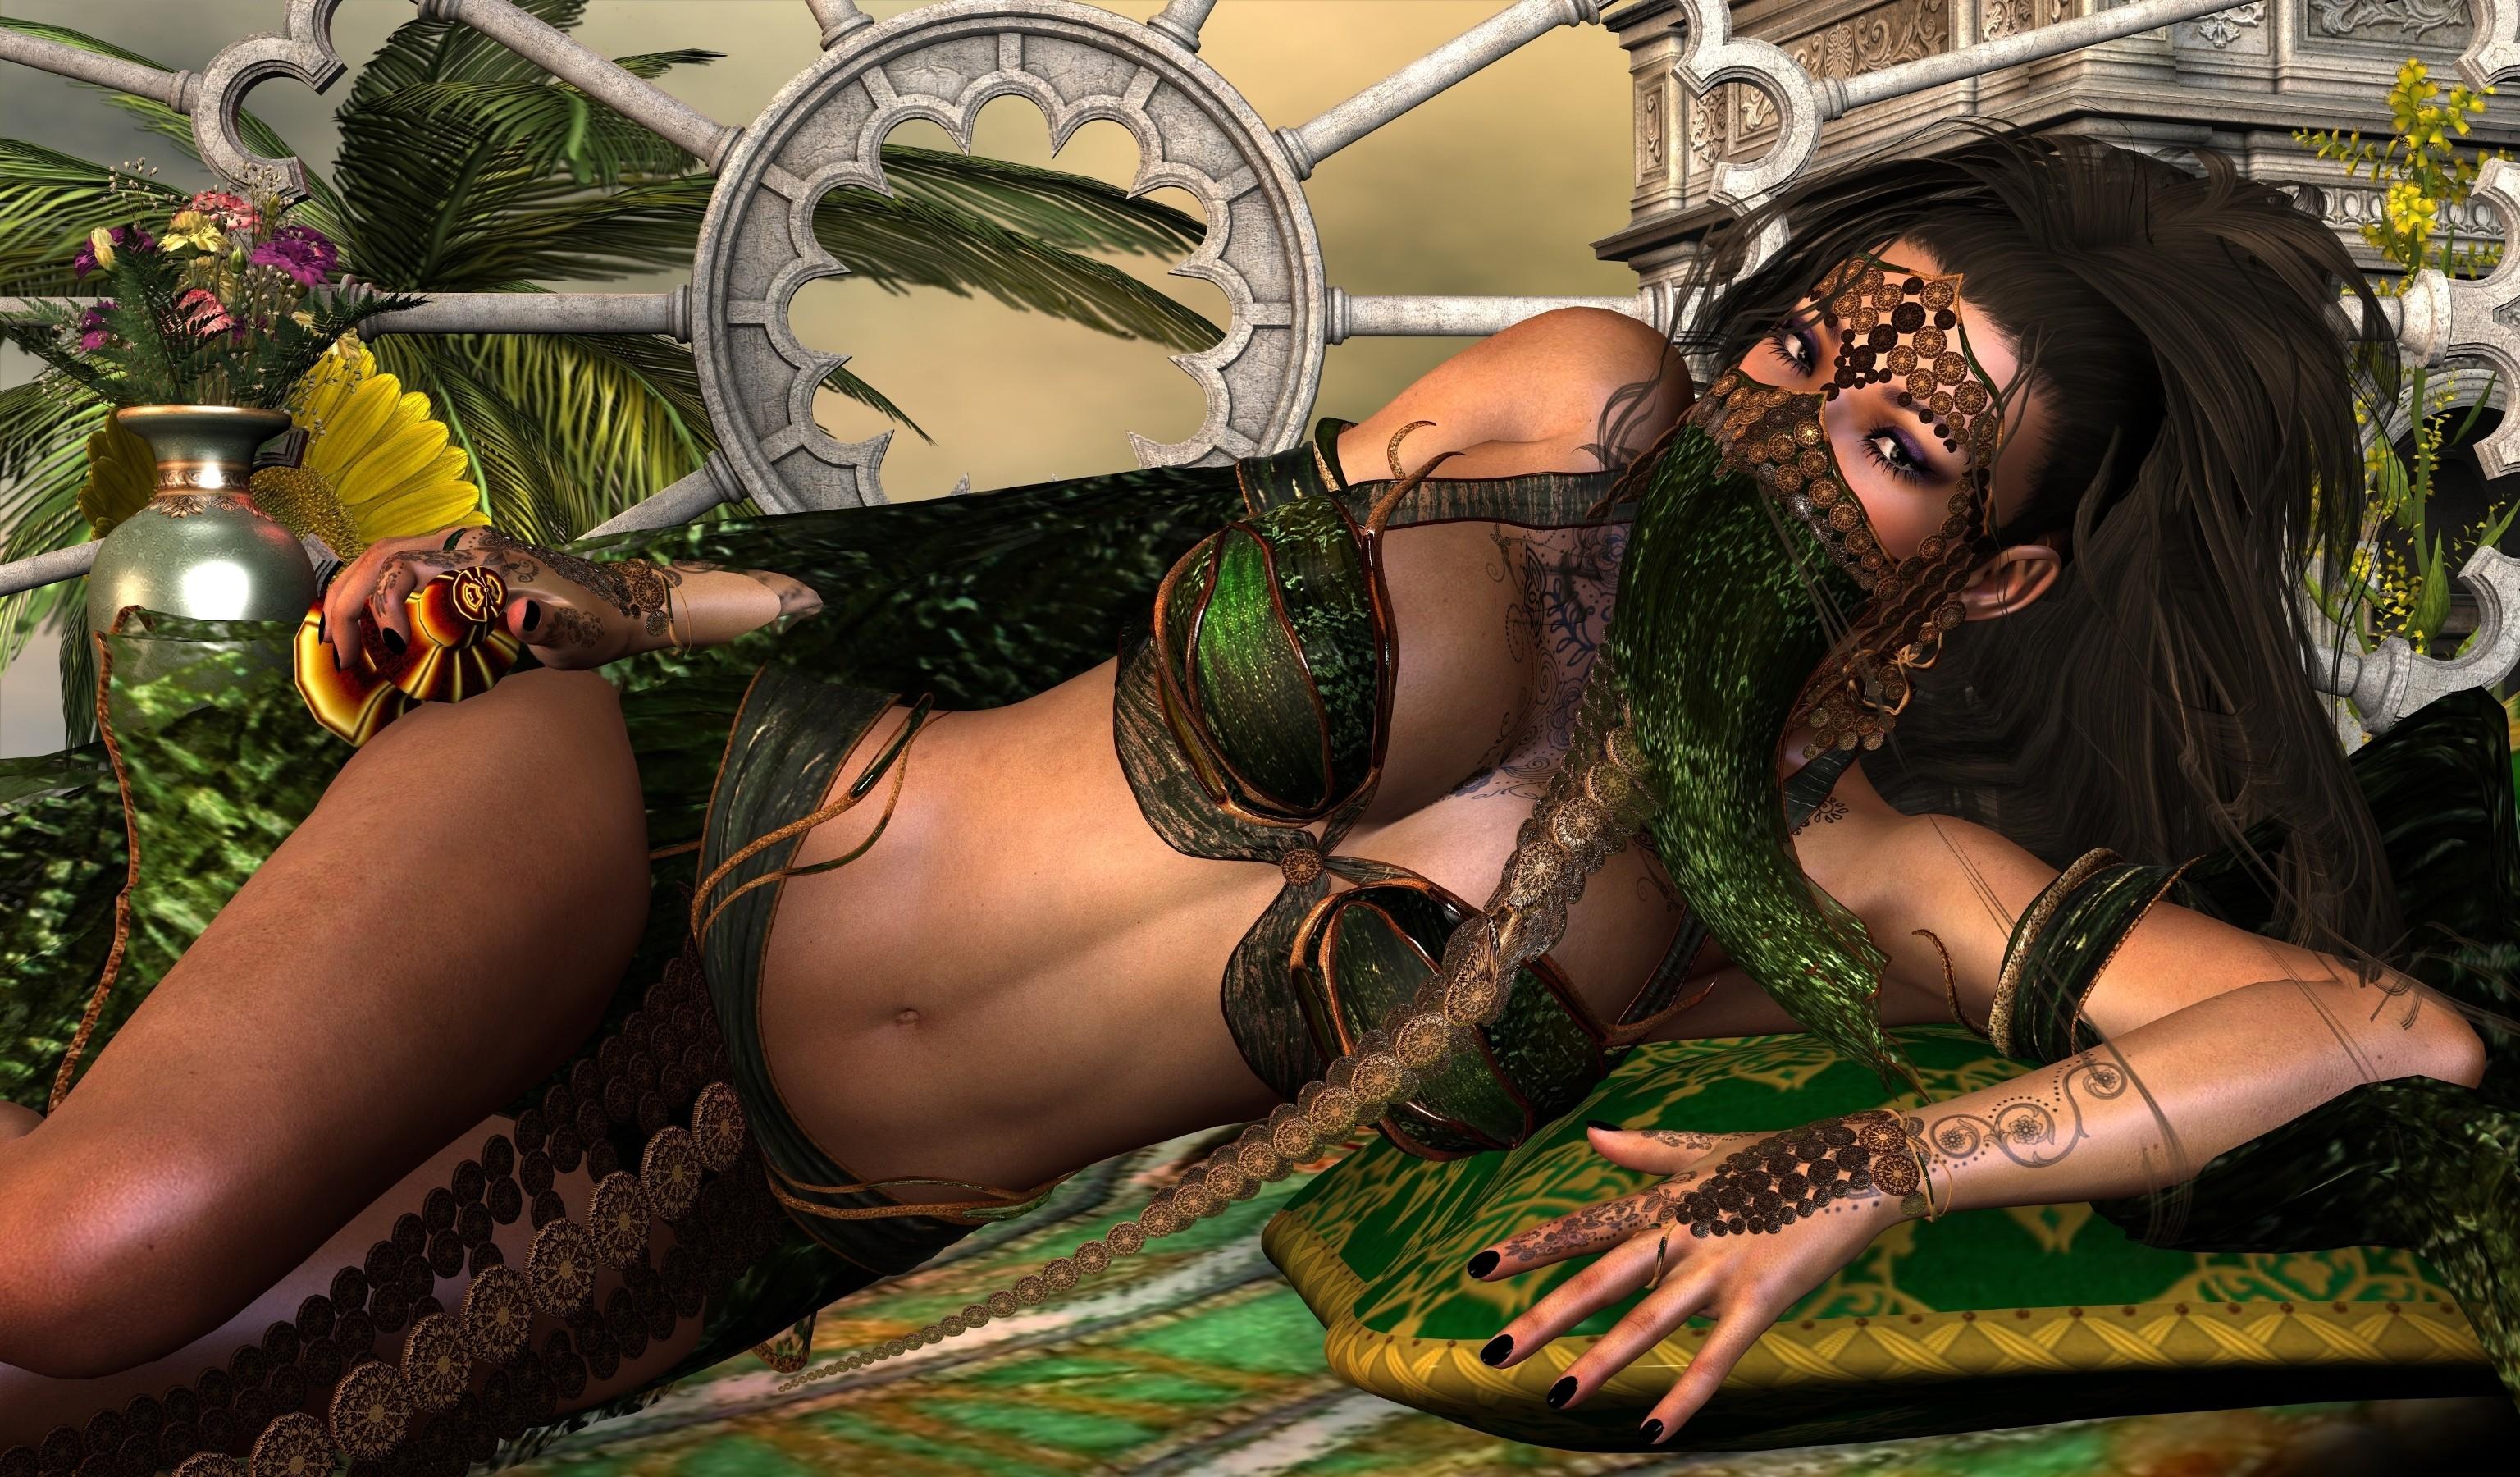 General 3072x1800 render digital art big boobs cleavage fantasy girl 3D